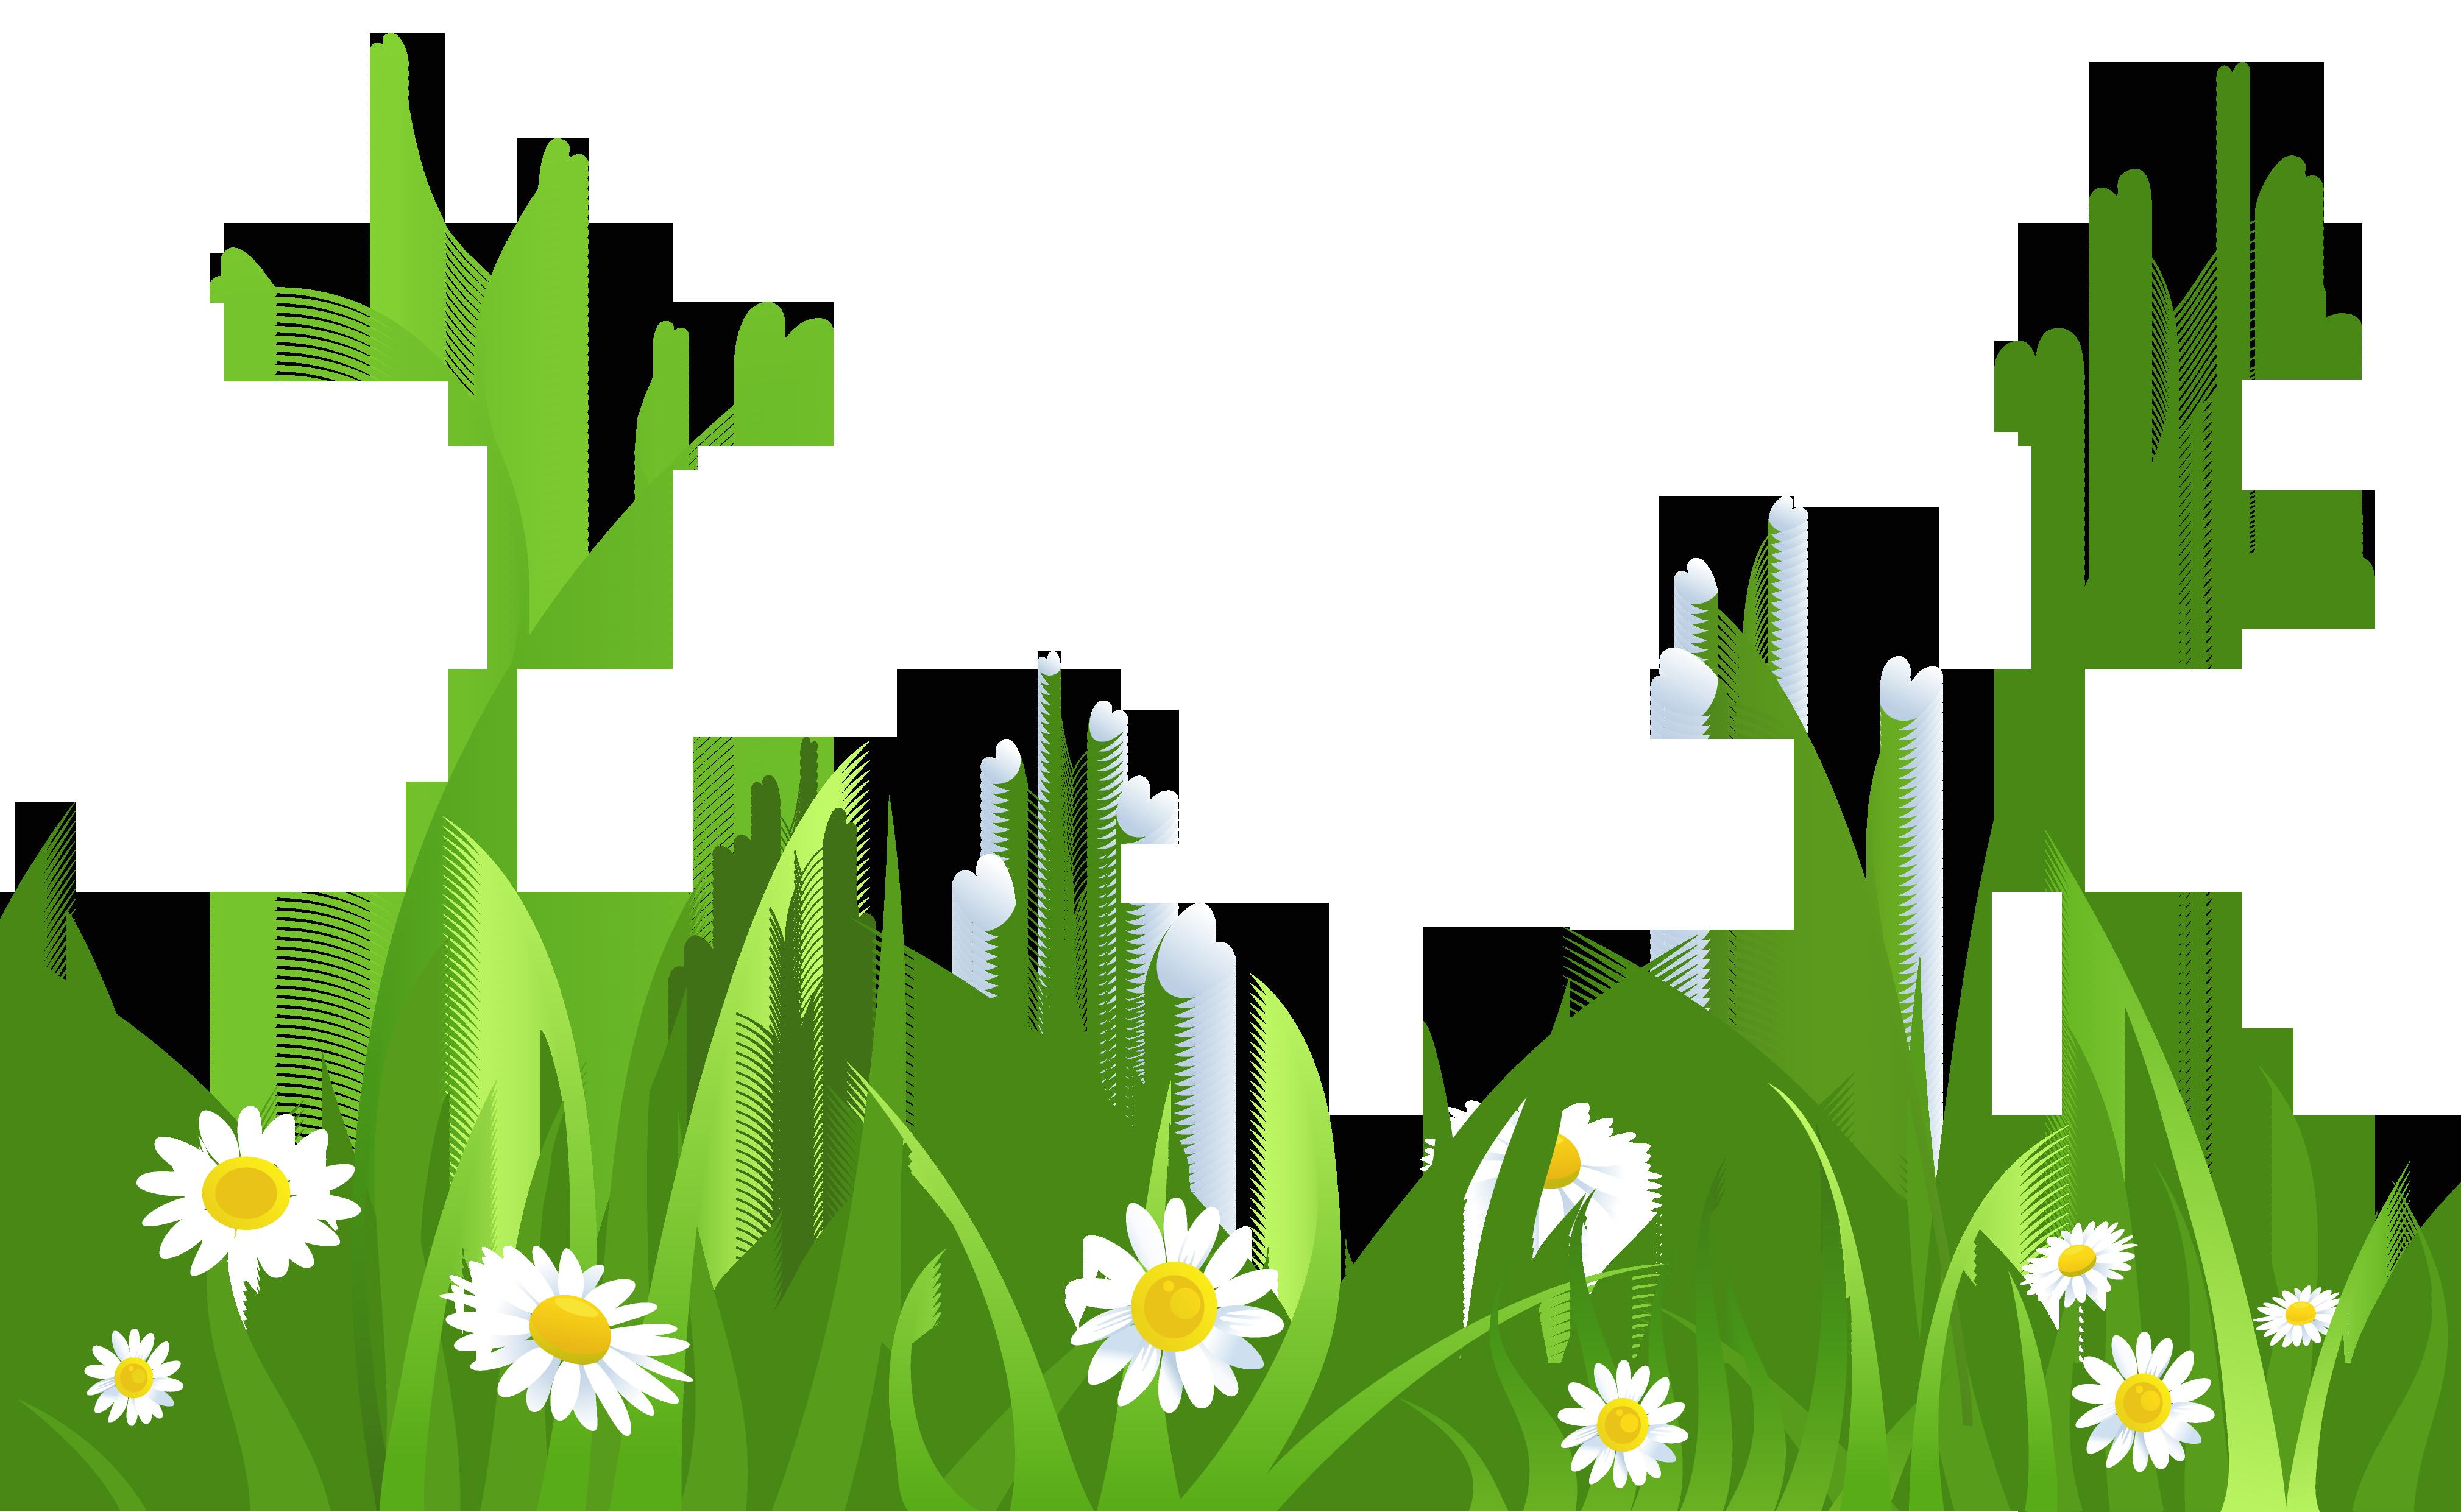 Summer flower border clipart free download Grass outline border free clipart images clipartix | Scrapbook Stuff ... free download